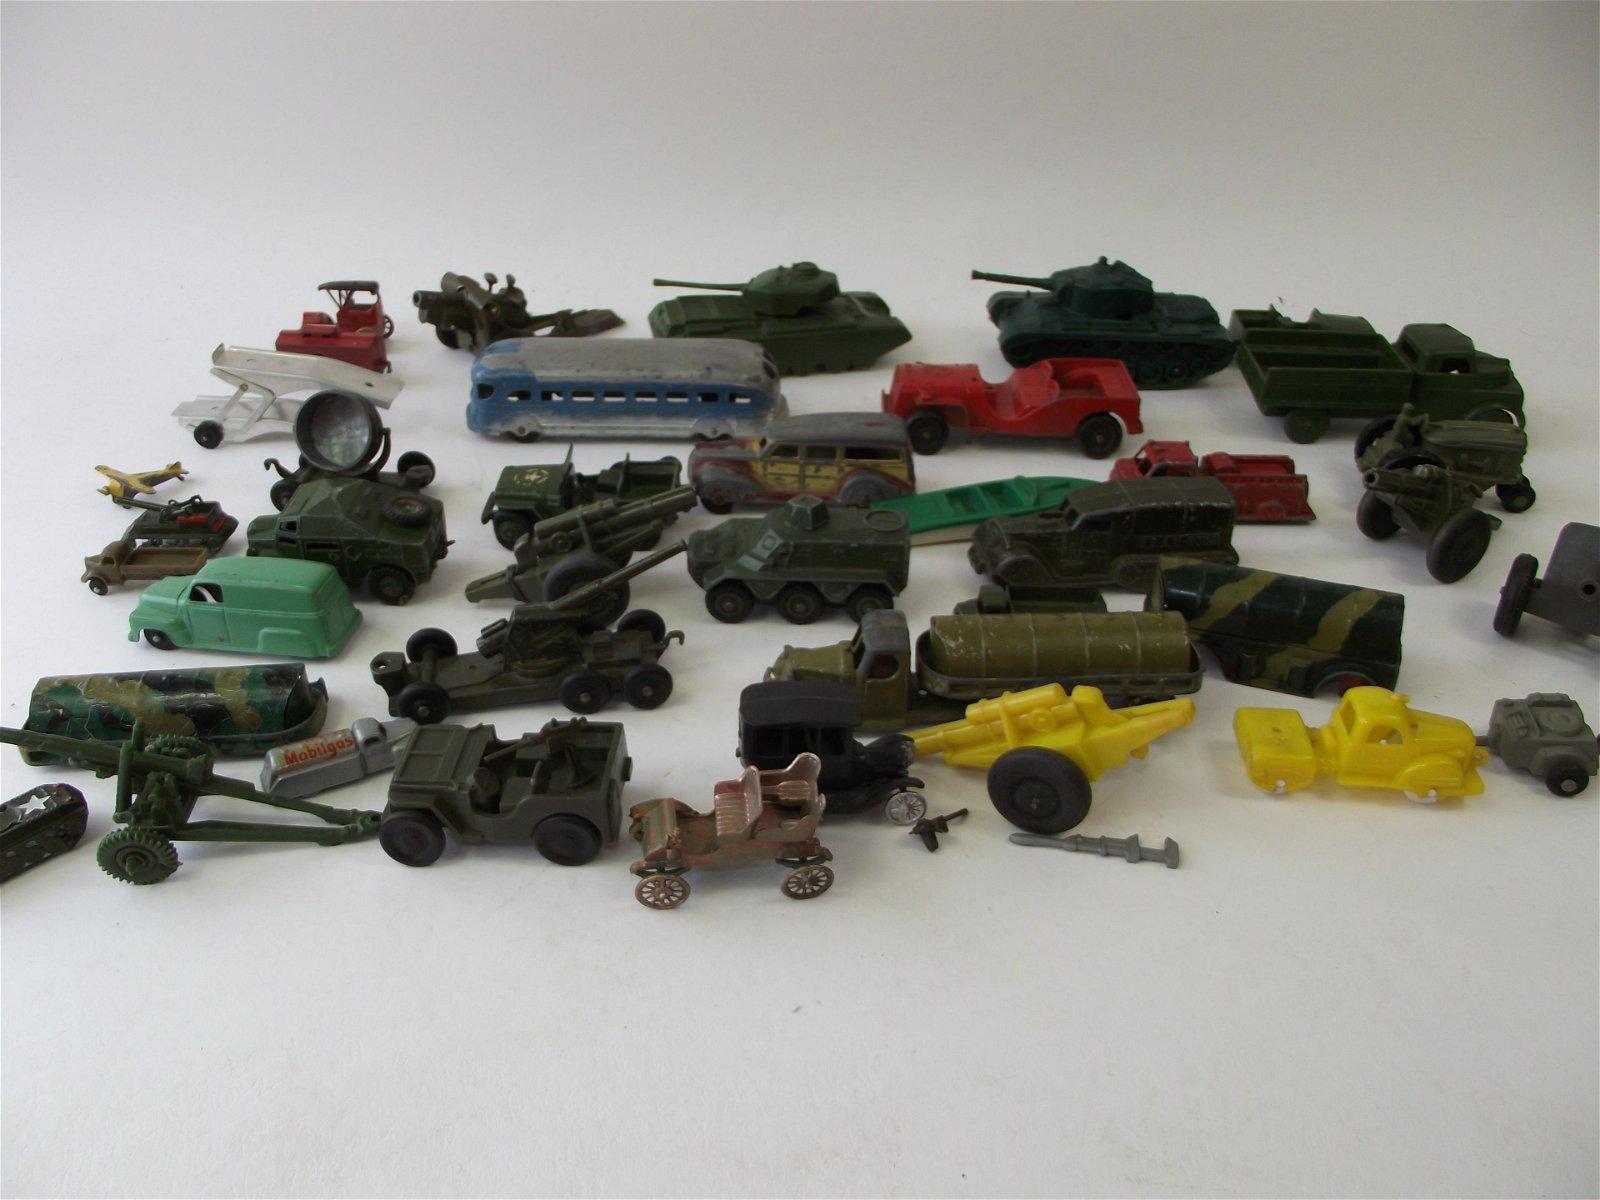 Vintage Toy Vehicle Lot